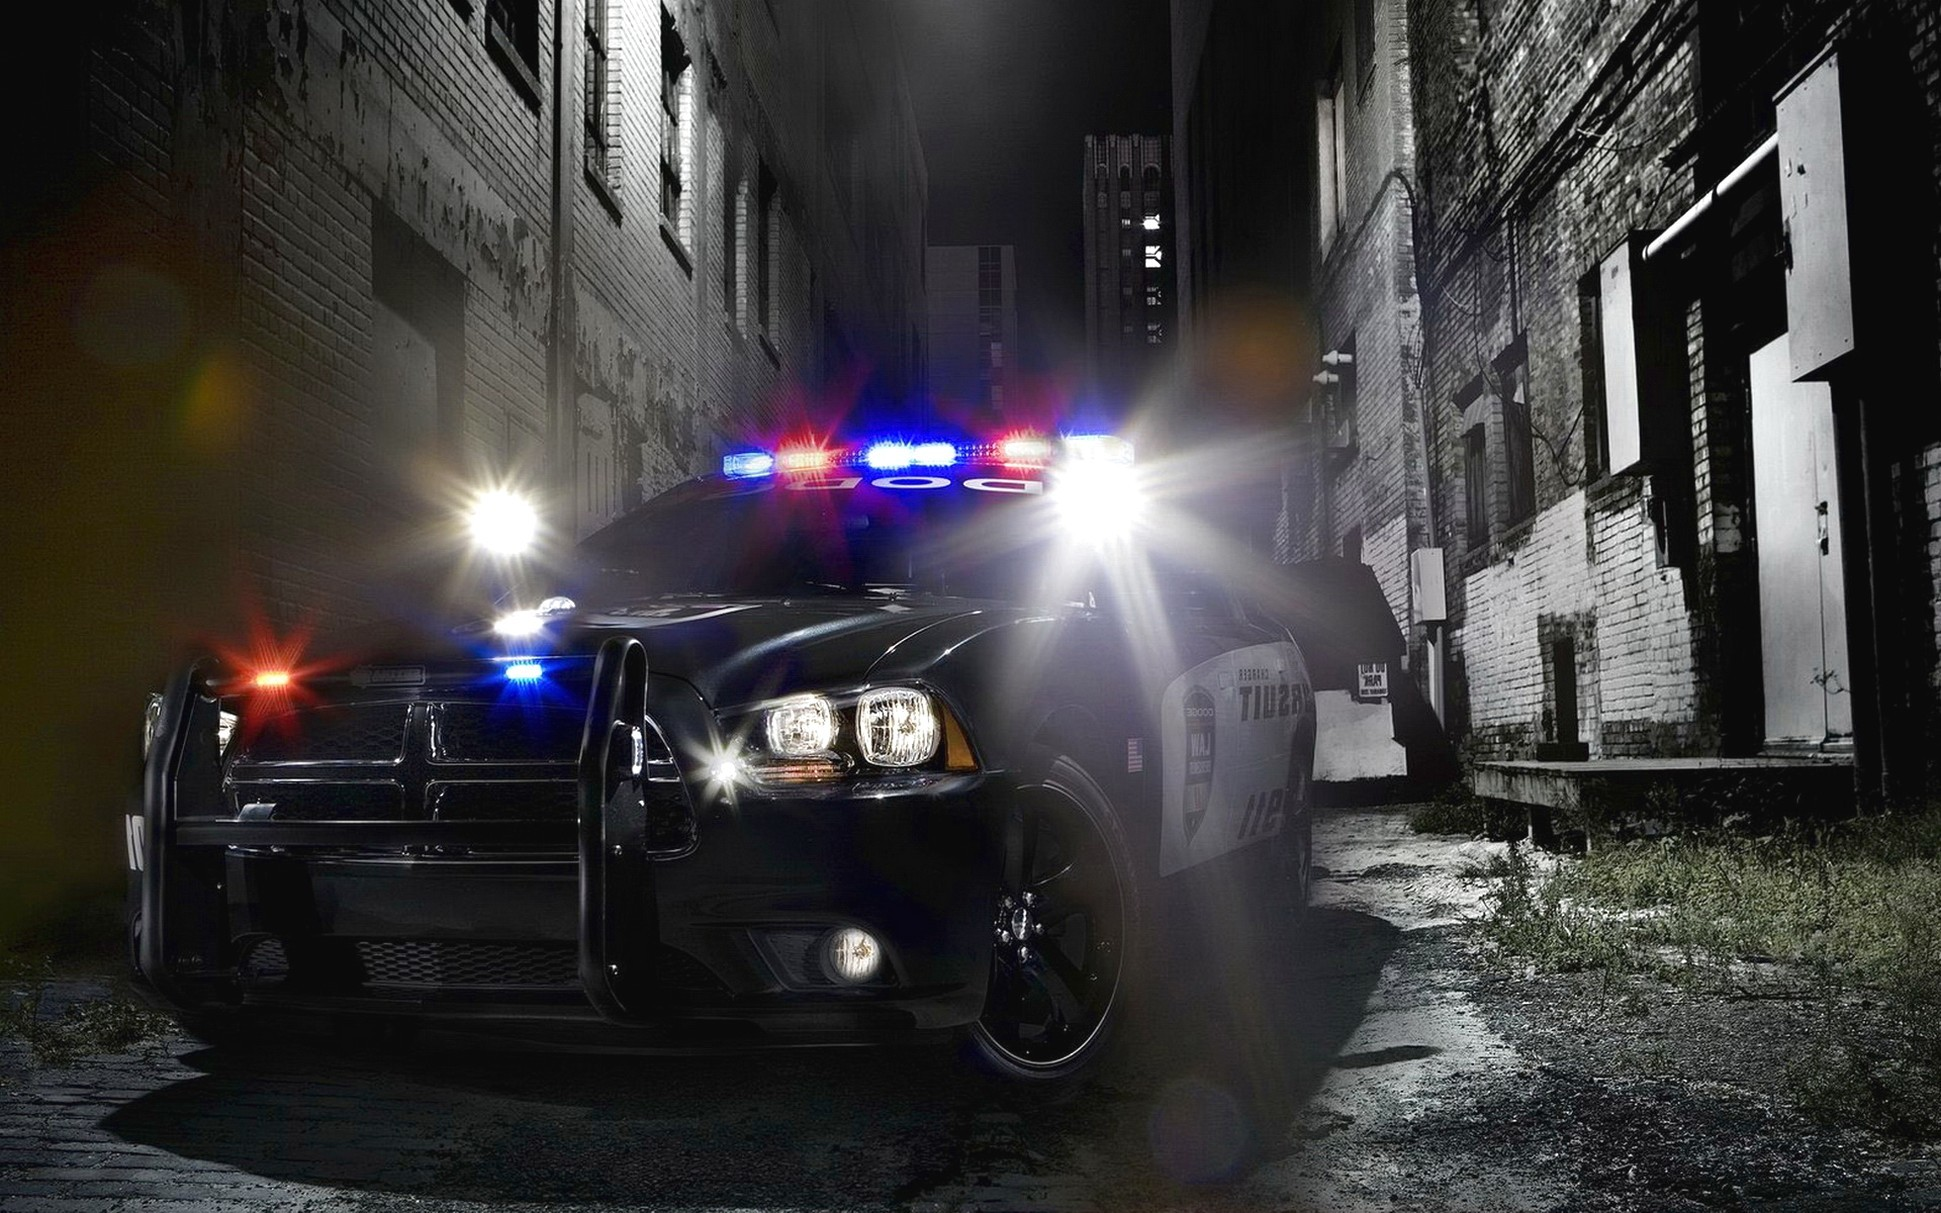 Police Car Wallpaper Background Hd by Carpichd